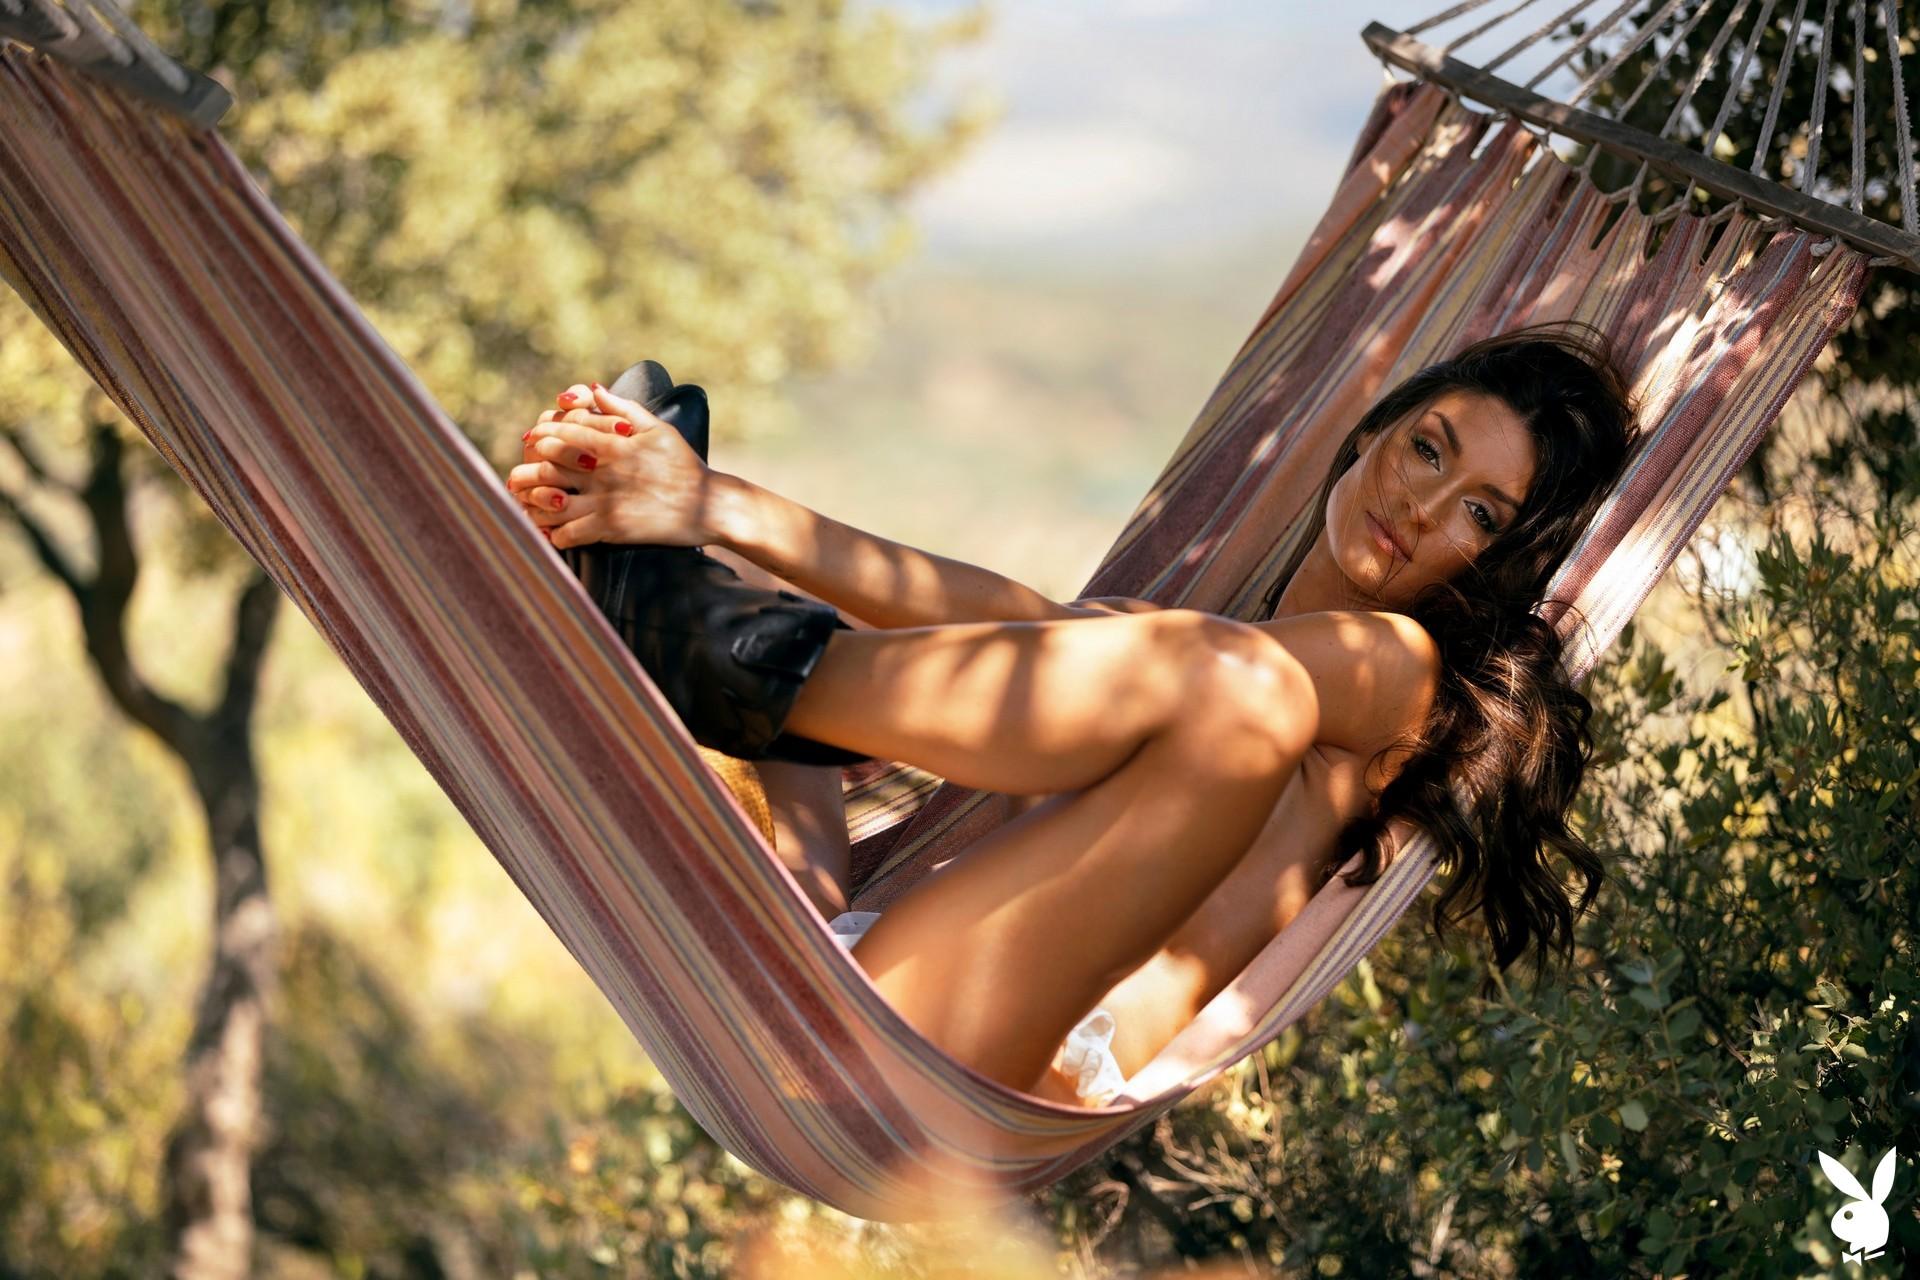 Zurine Aspiunza In Playboy International Playboy Plus (16)